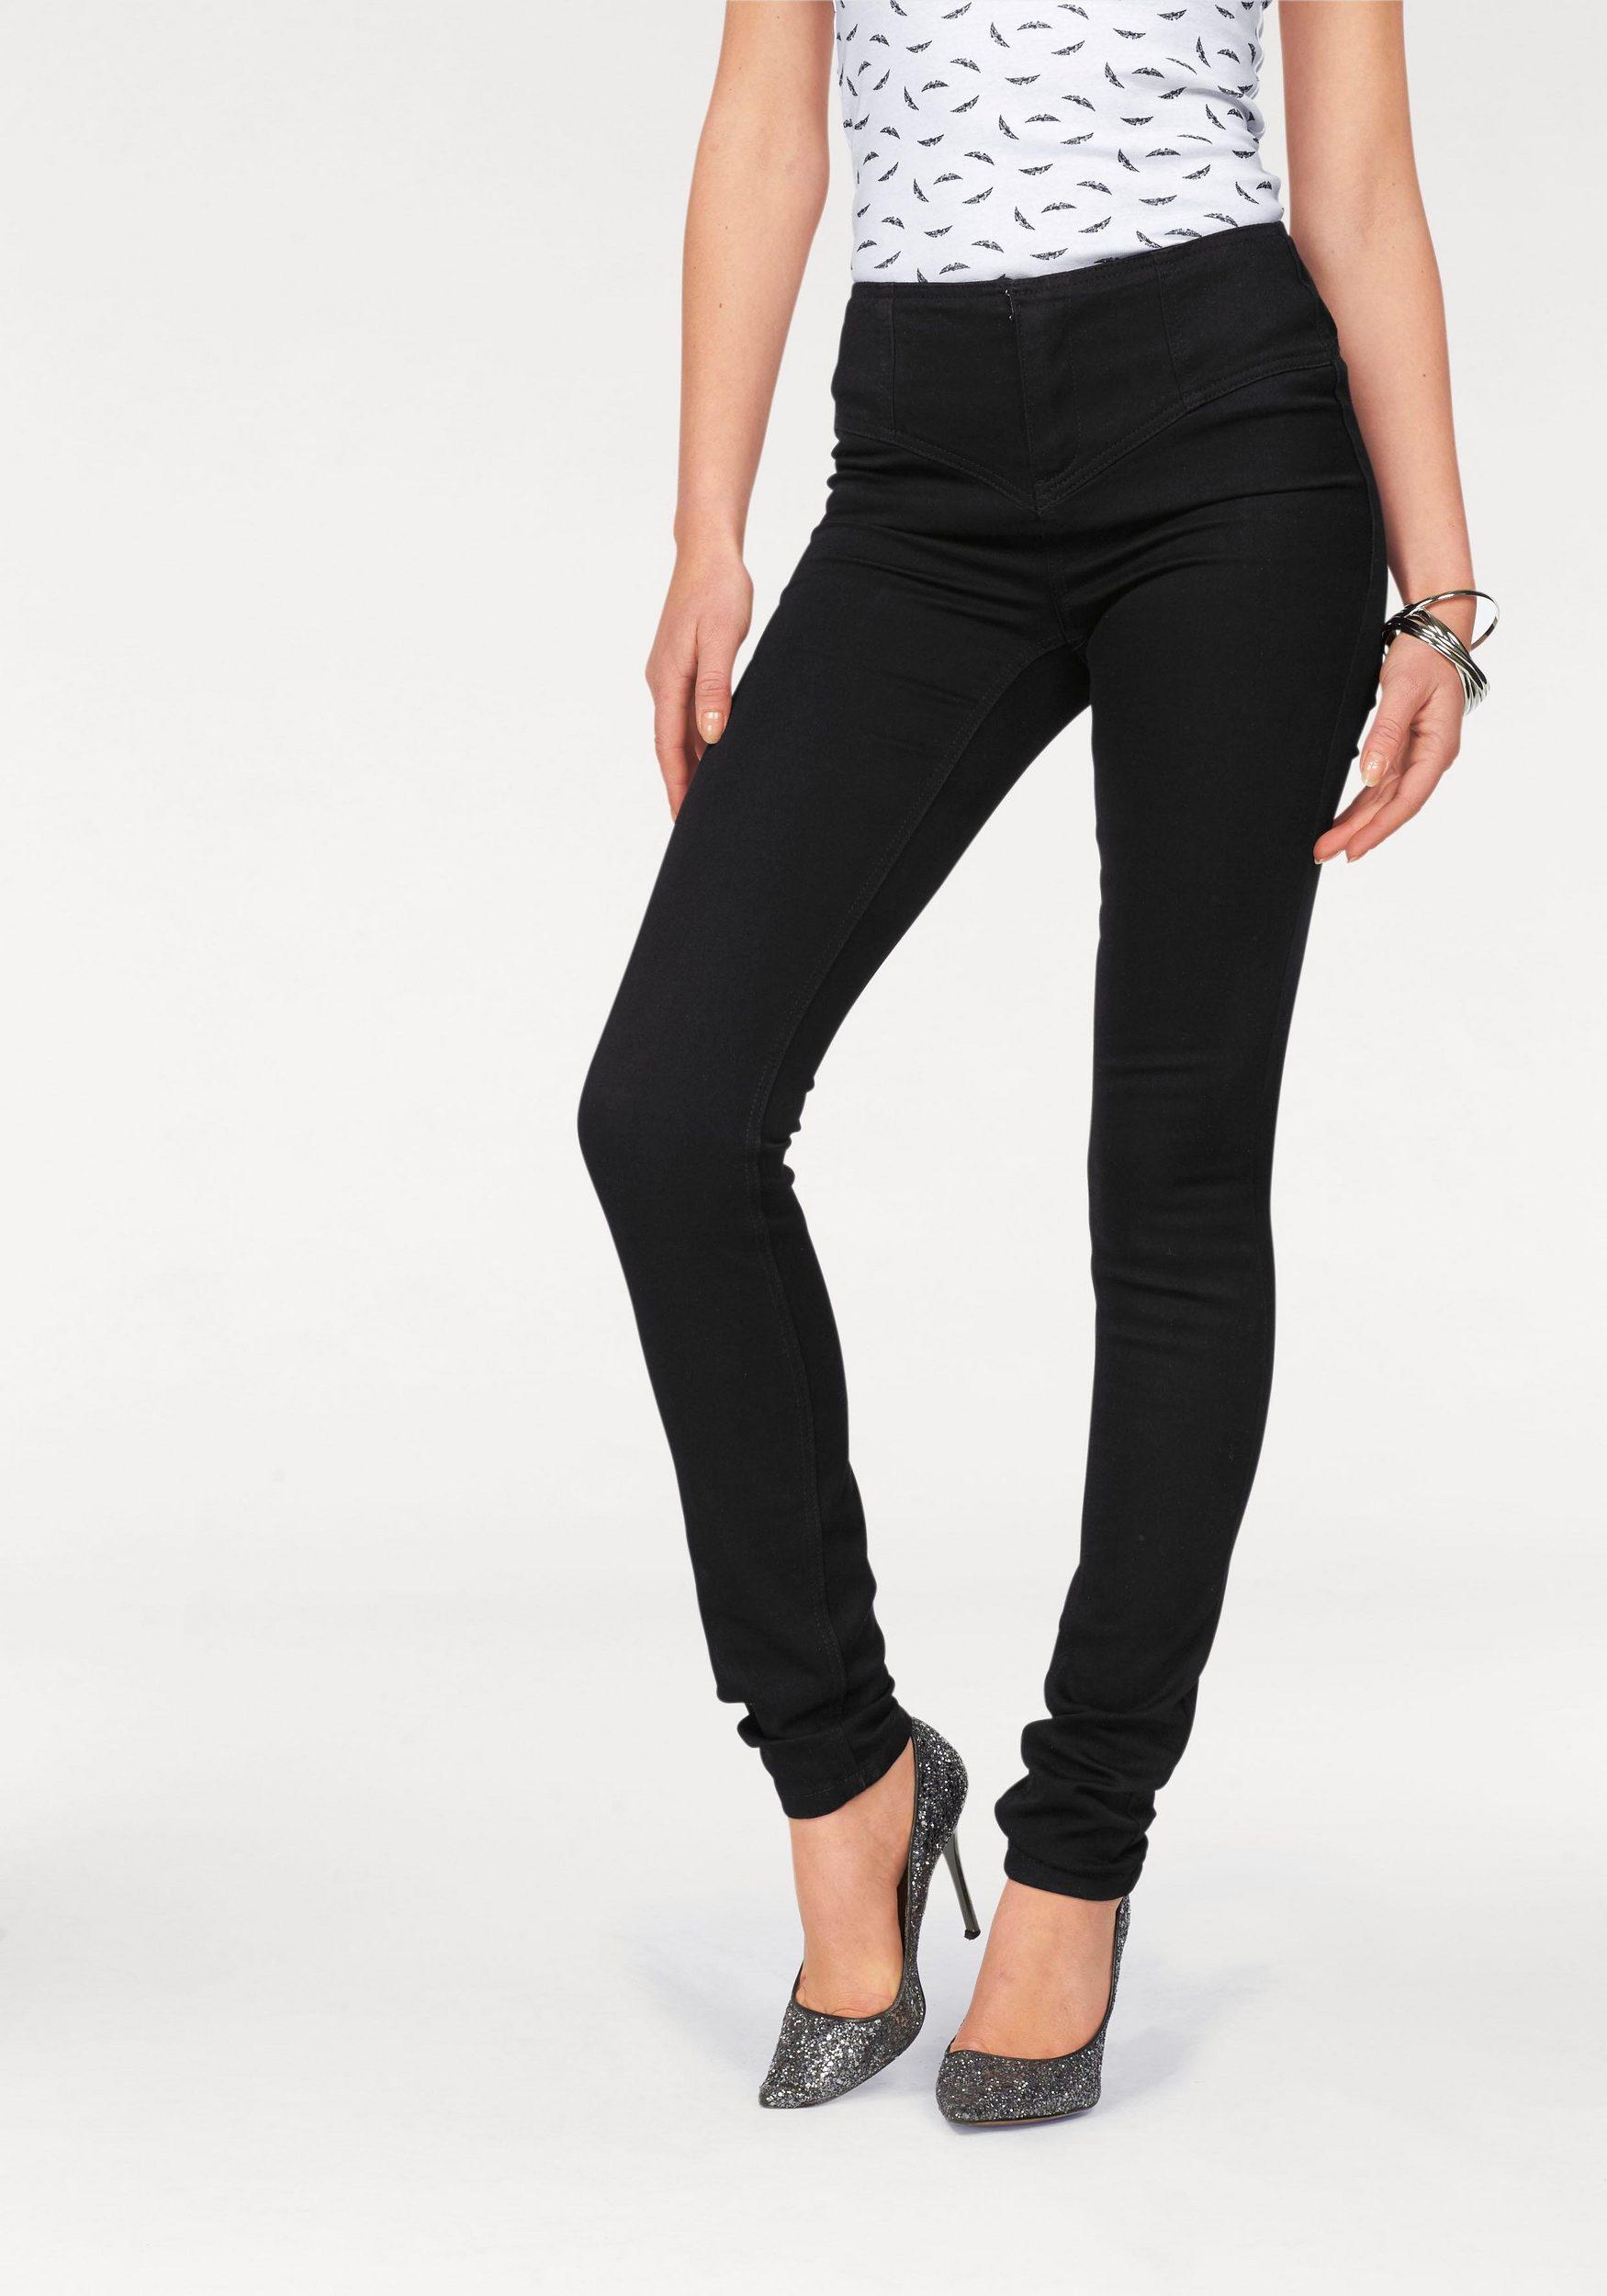 Nur heute: Arizona Skinny-fit-Jeans 50% reduziert